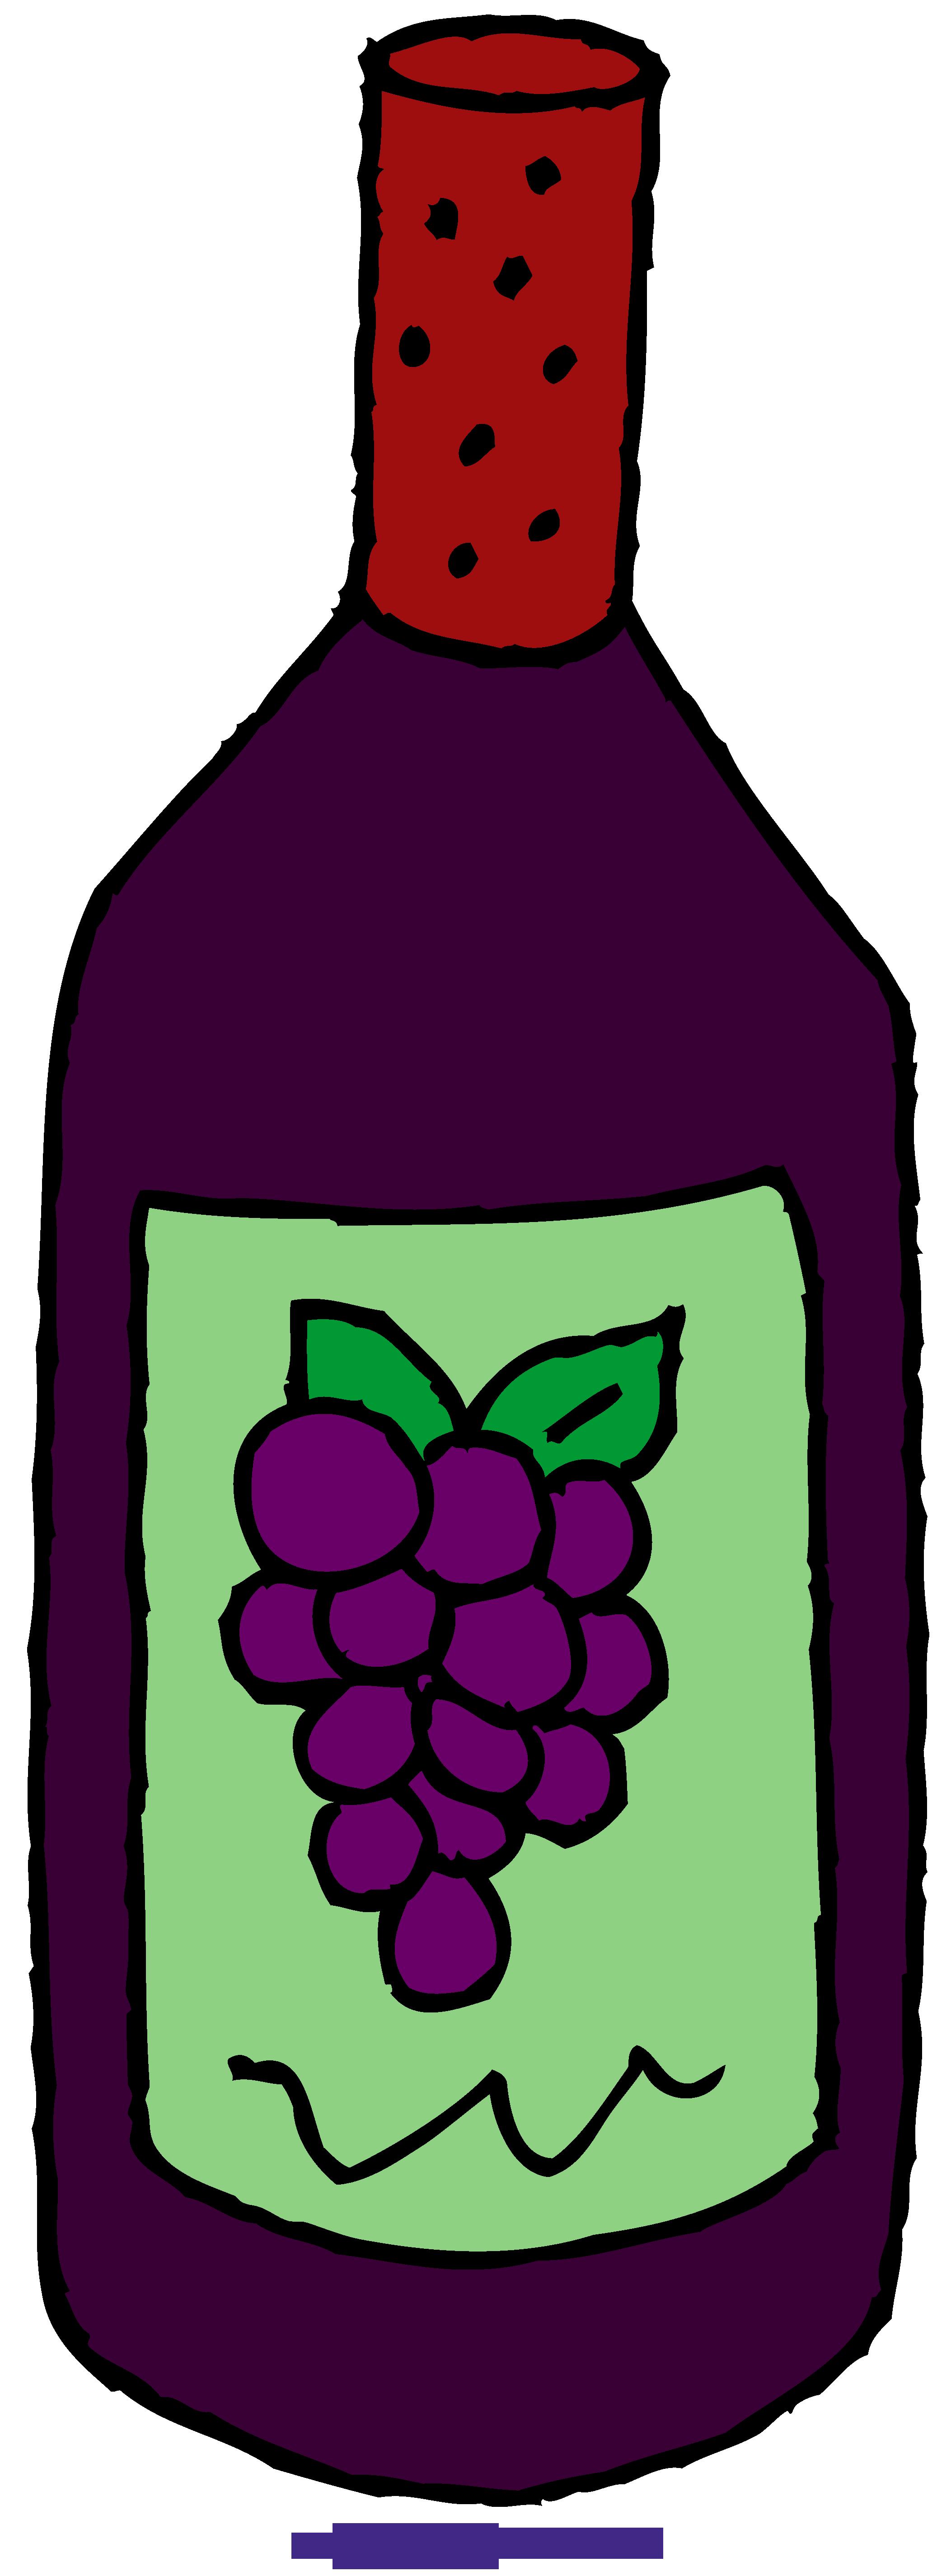 wine bottle clipart clipart sweet clip art rh m sweetclipart com wine bottle clip art free printables wine bottle clipart png